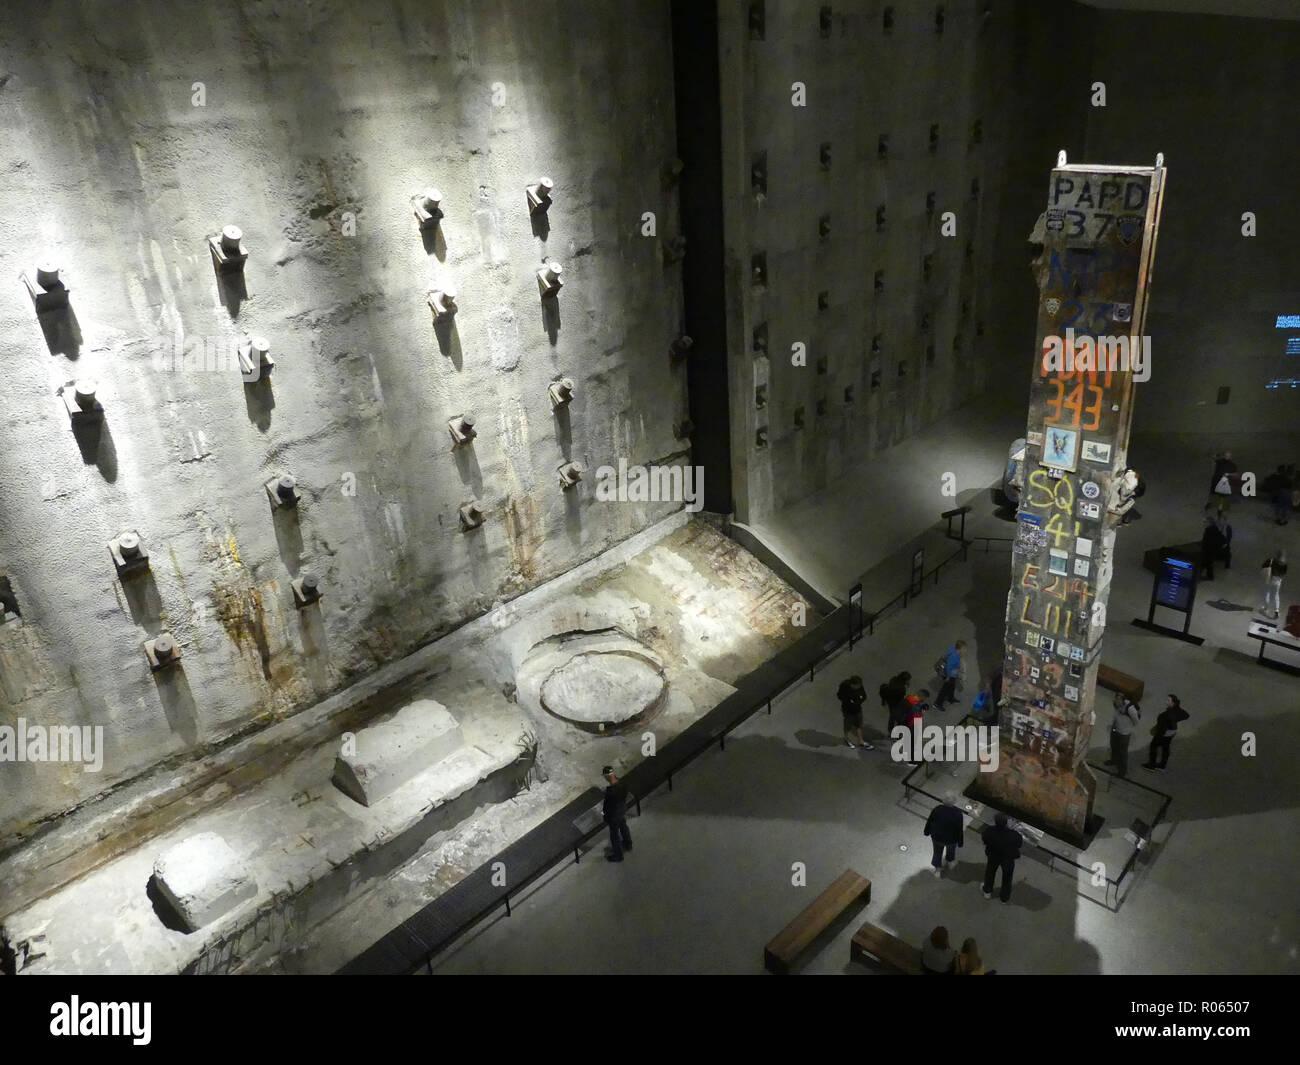 NEW YORK 9/11 TRIBUT MUSEUM DER STIFTUNG Halle im Keller. Foto: Tony Gale Stockbild